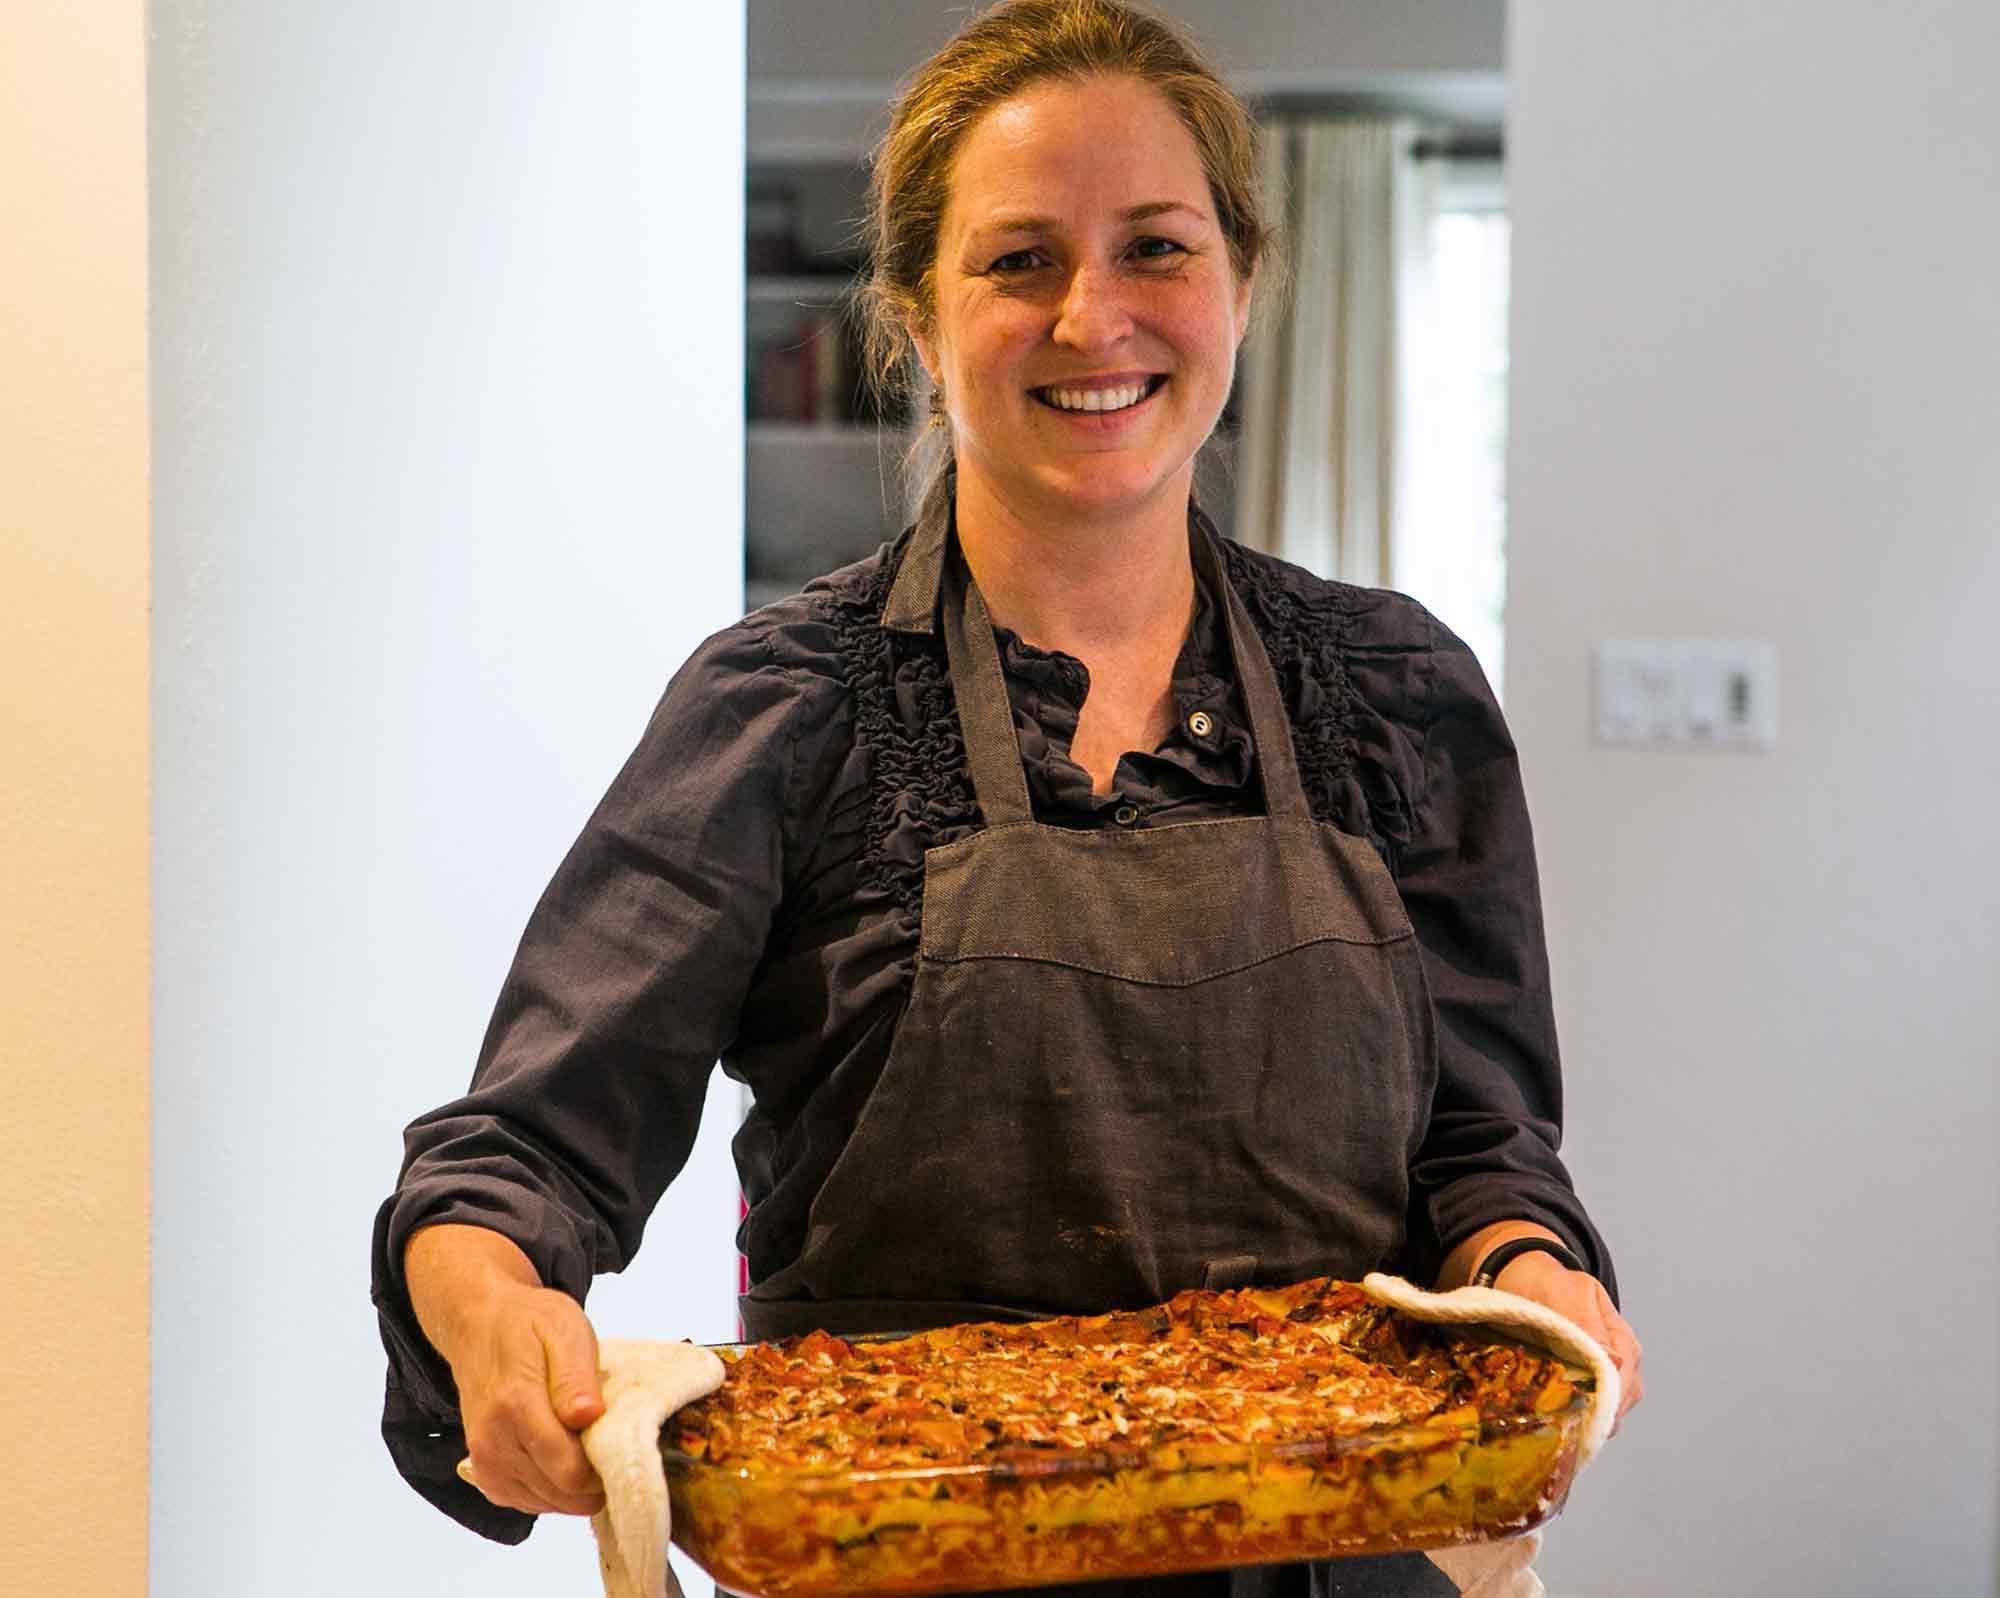 Elise Bauer with Vegetarian Spinach Mushroom Lasagna